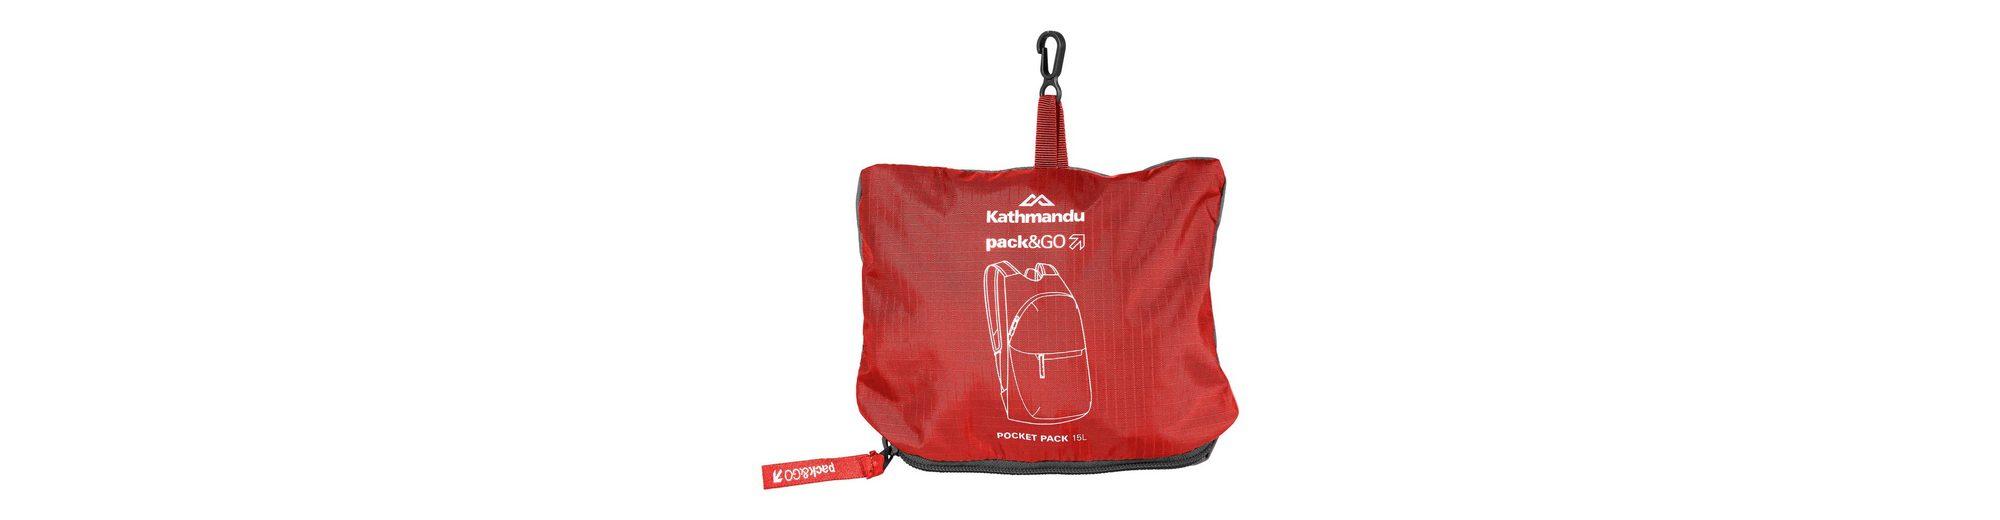 Kathmandu Faltbare 15 Liter Tasche Pocket Pack v4 Verkauf Online-Shopping Günstig Kaufen Footlocker Bilder 9Z6NQyI